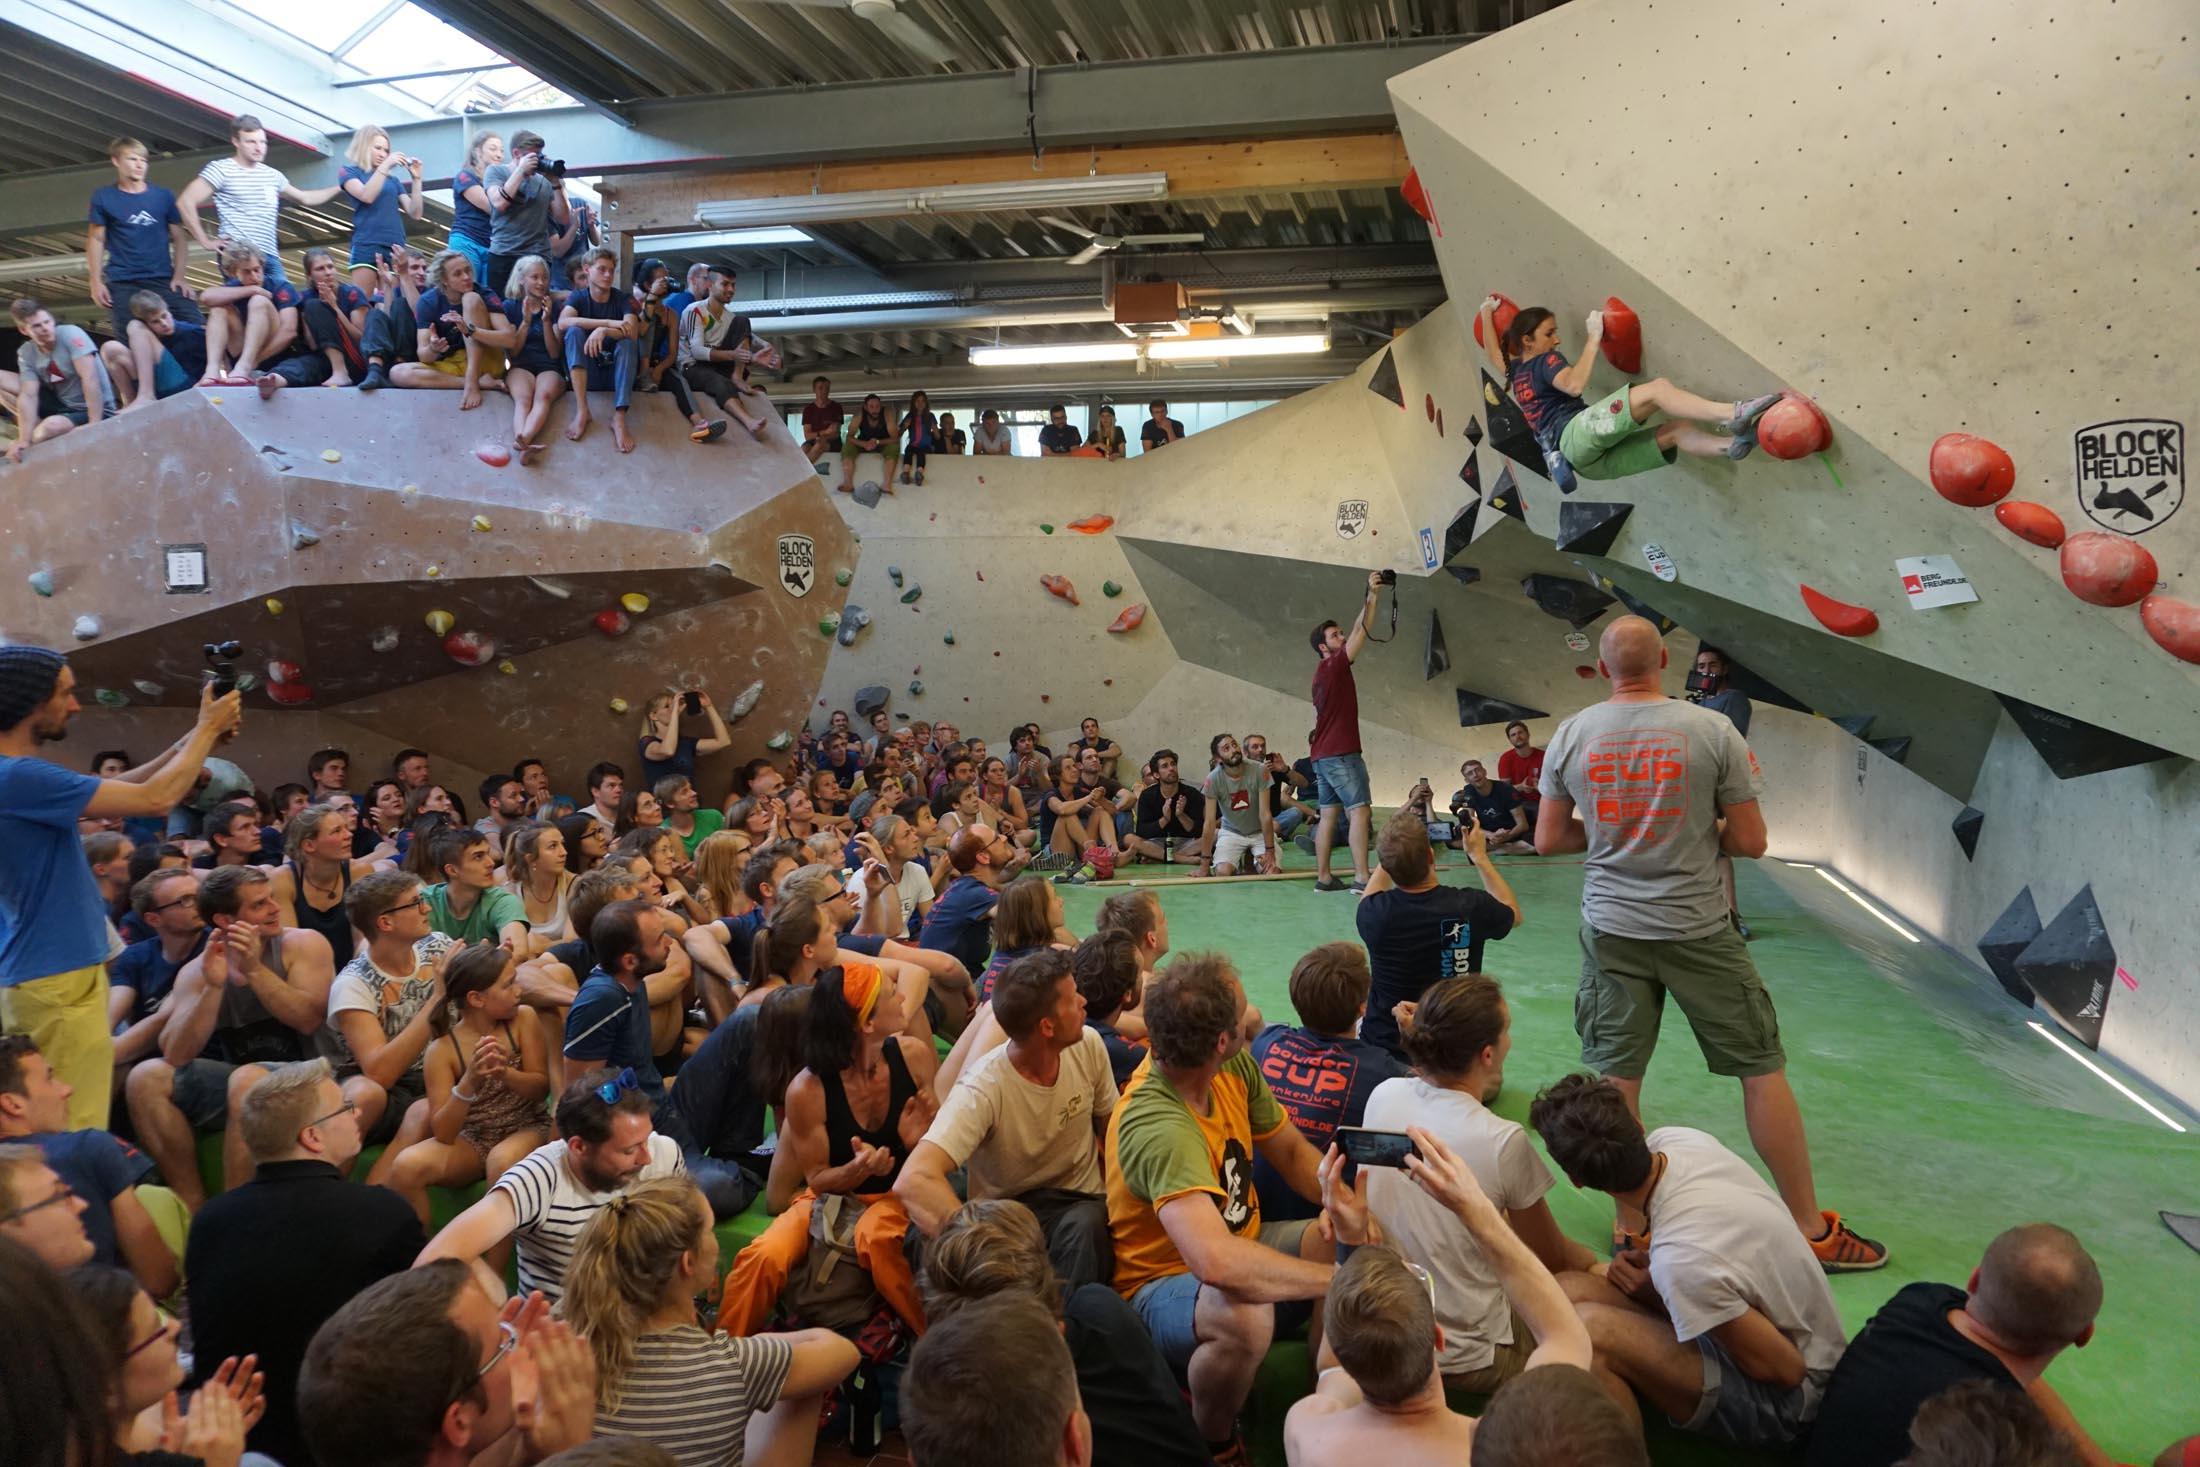 Juliane Wurm, internationaler bouldercup Frankenjura, BLOCKHELDEN Erlangen, Bergfreunde.de, Mammut07092016044